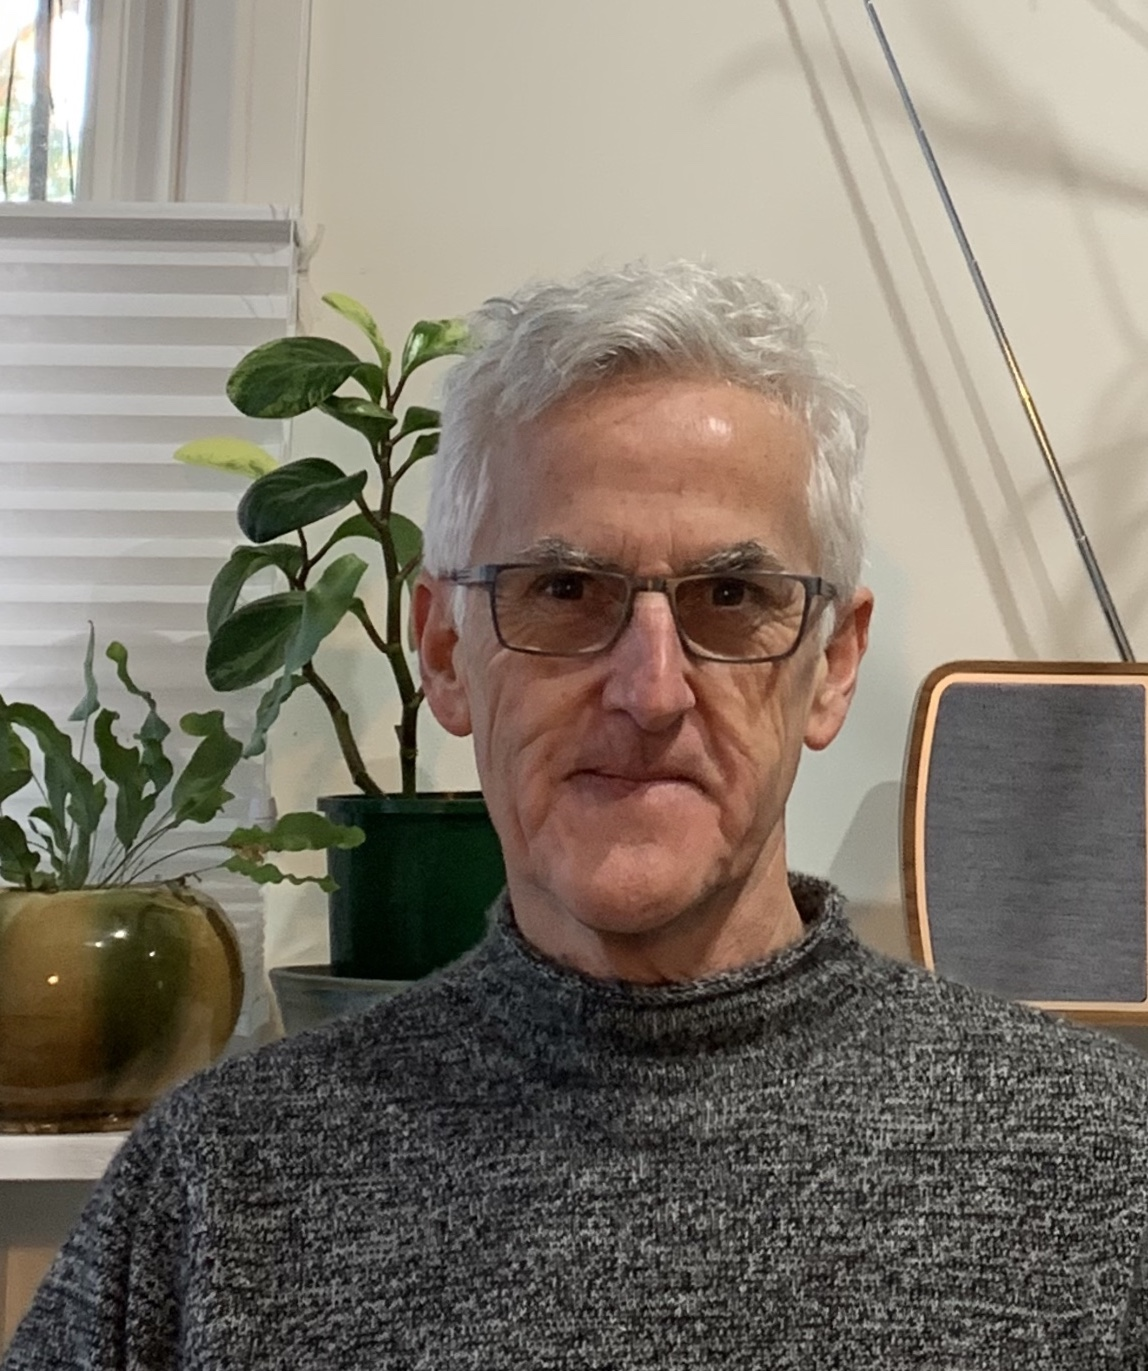 Associate Professor David Paul Blaazer